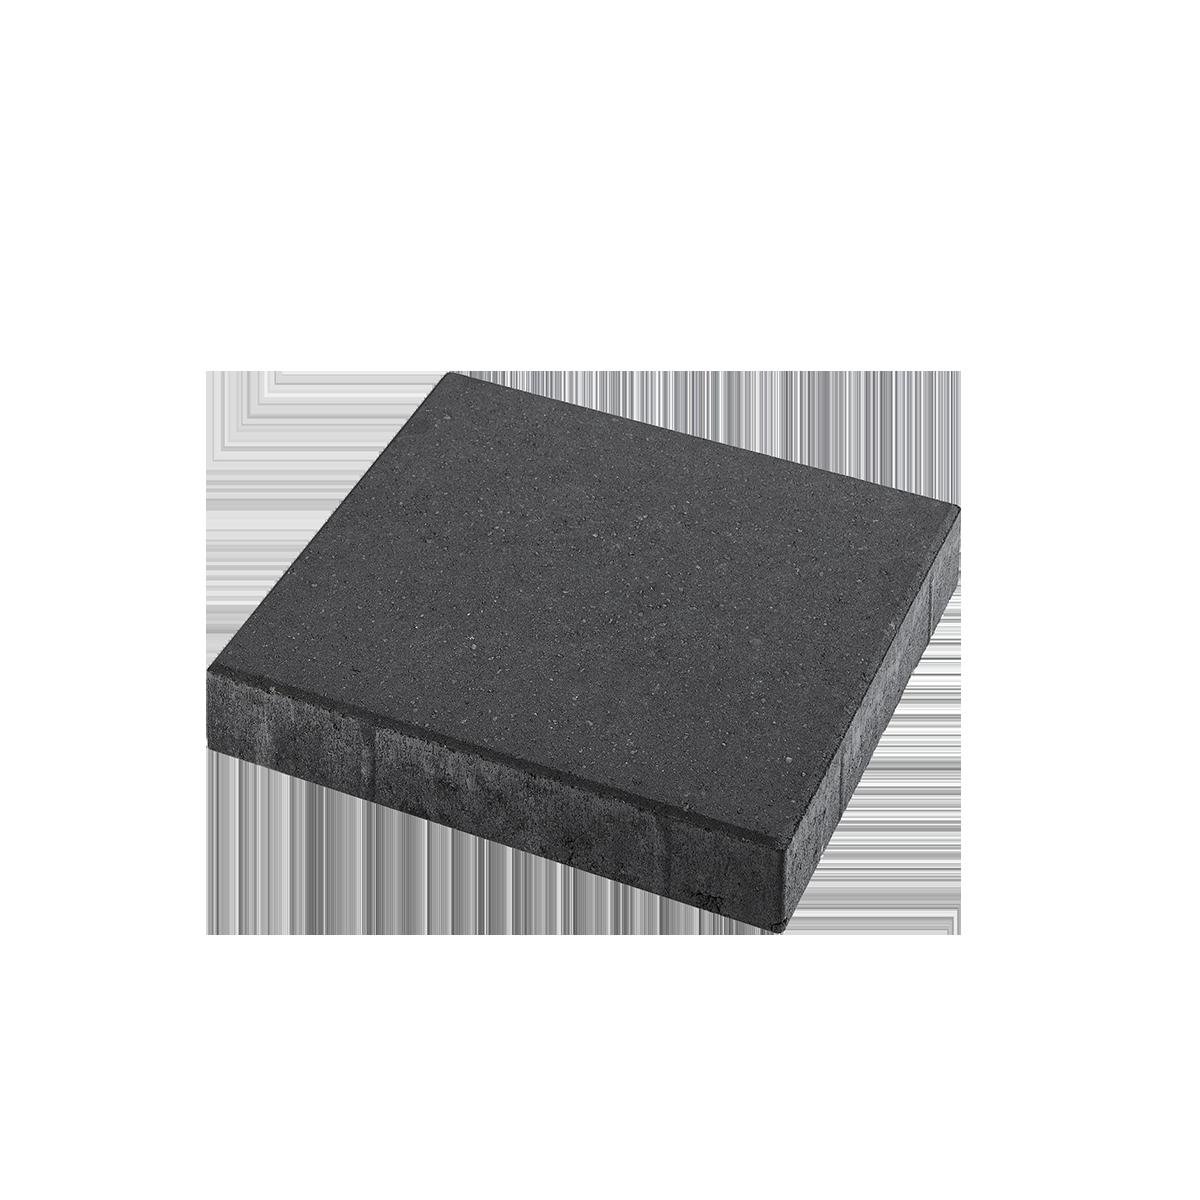 Fliser 40x40x8 cm Sort/Antracit